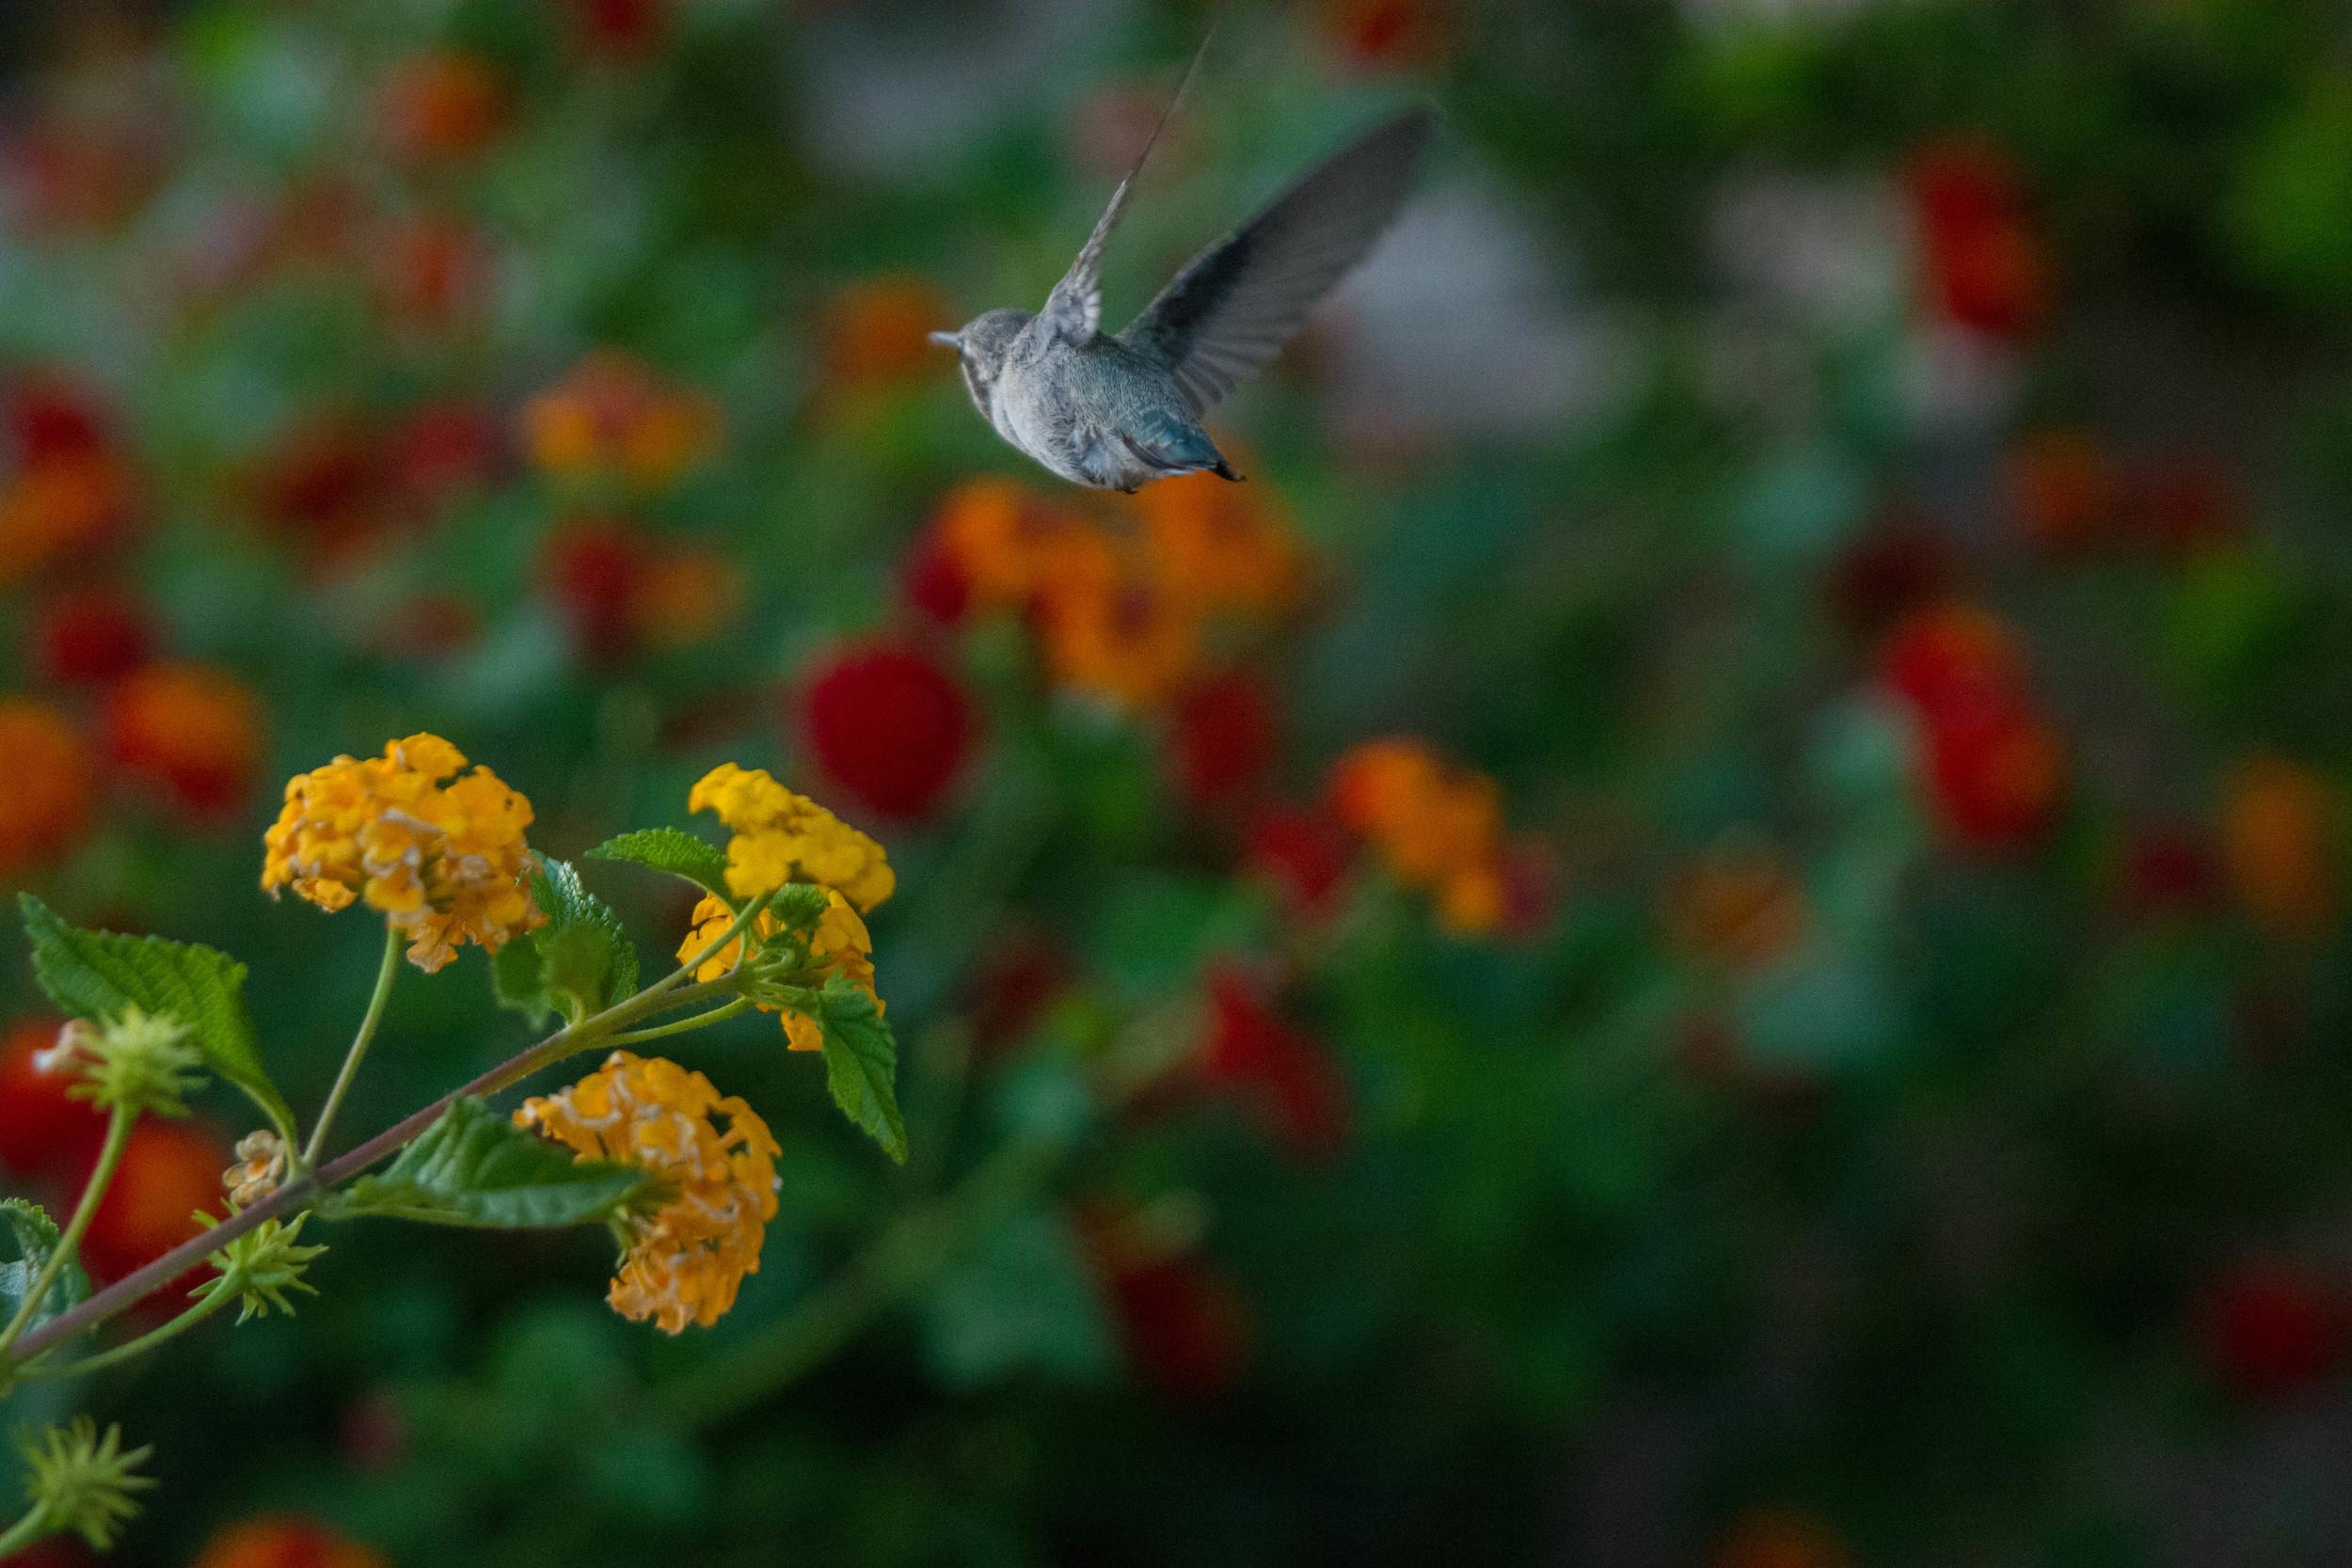 Humming Bird Flying Away